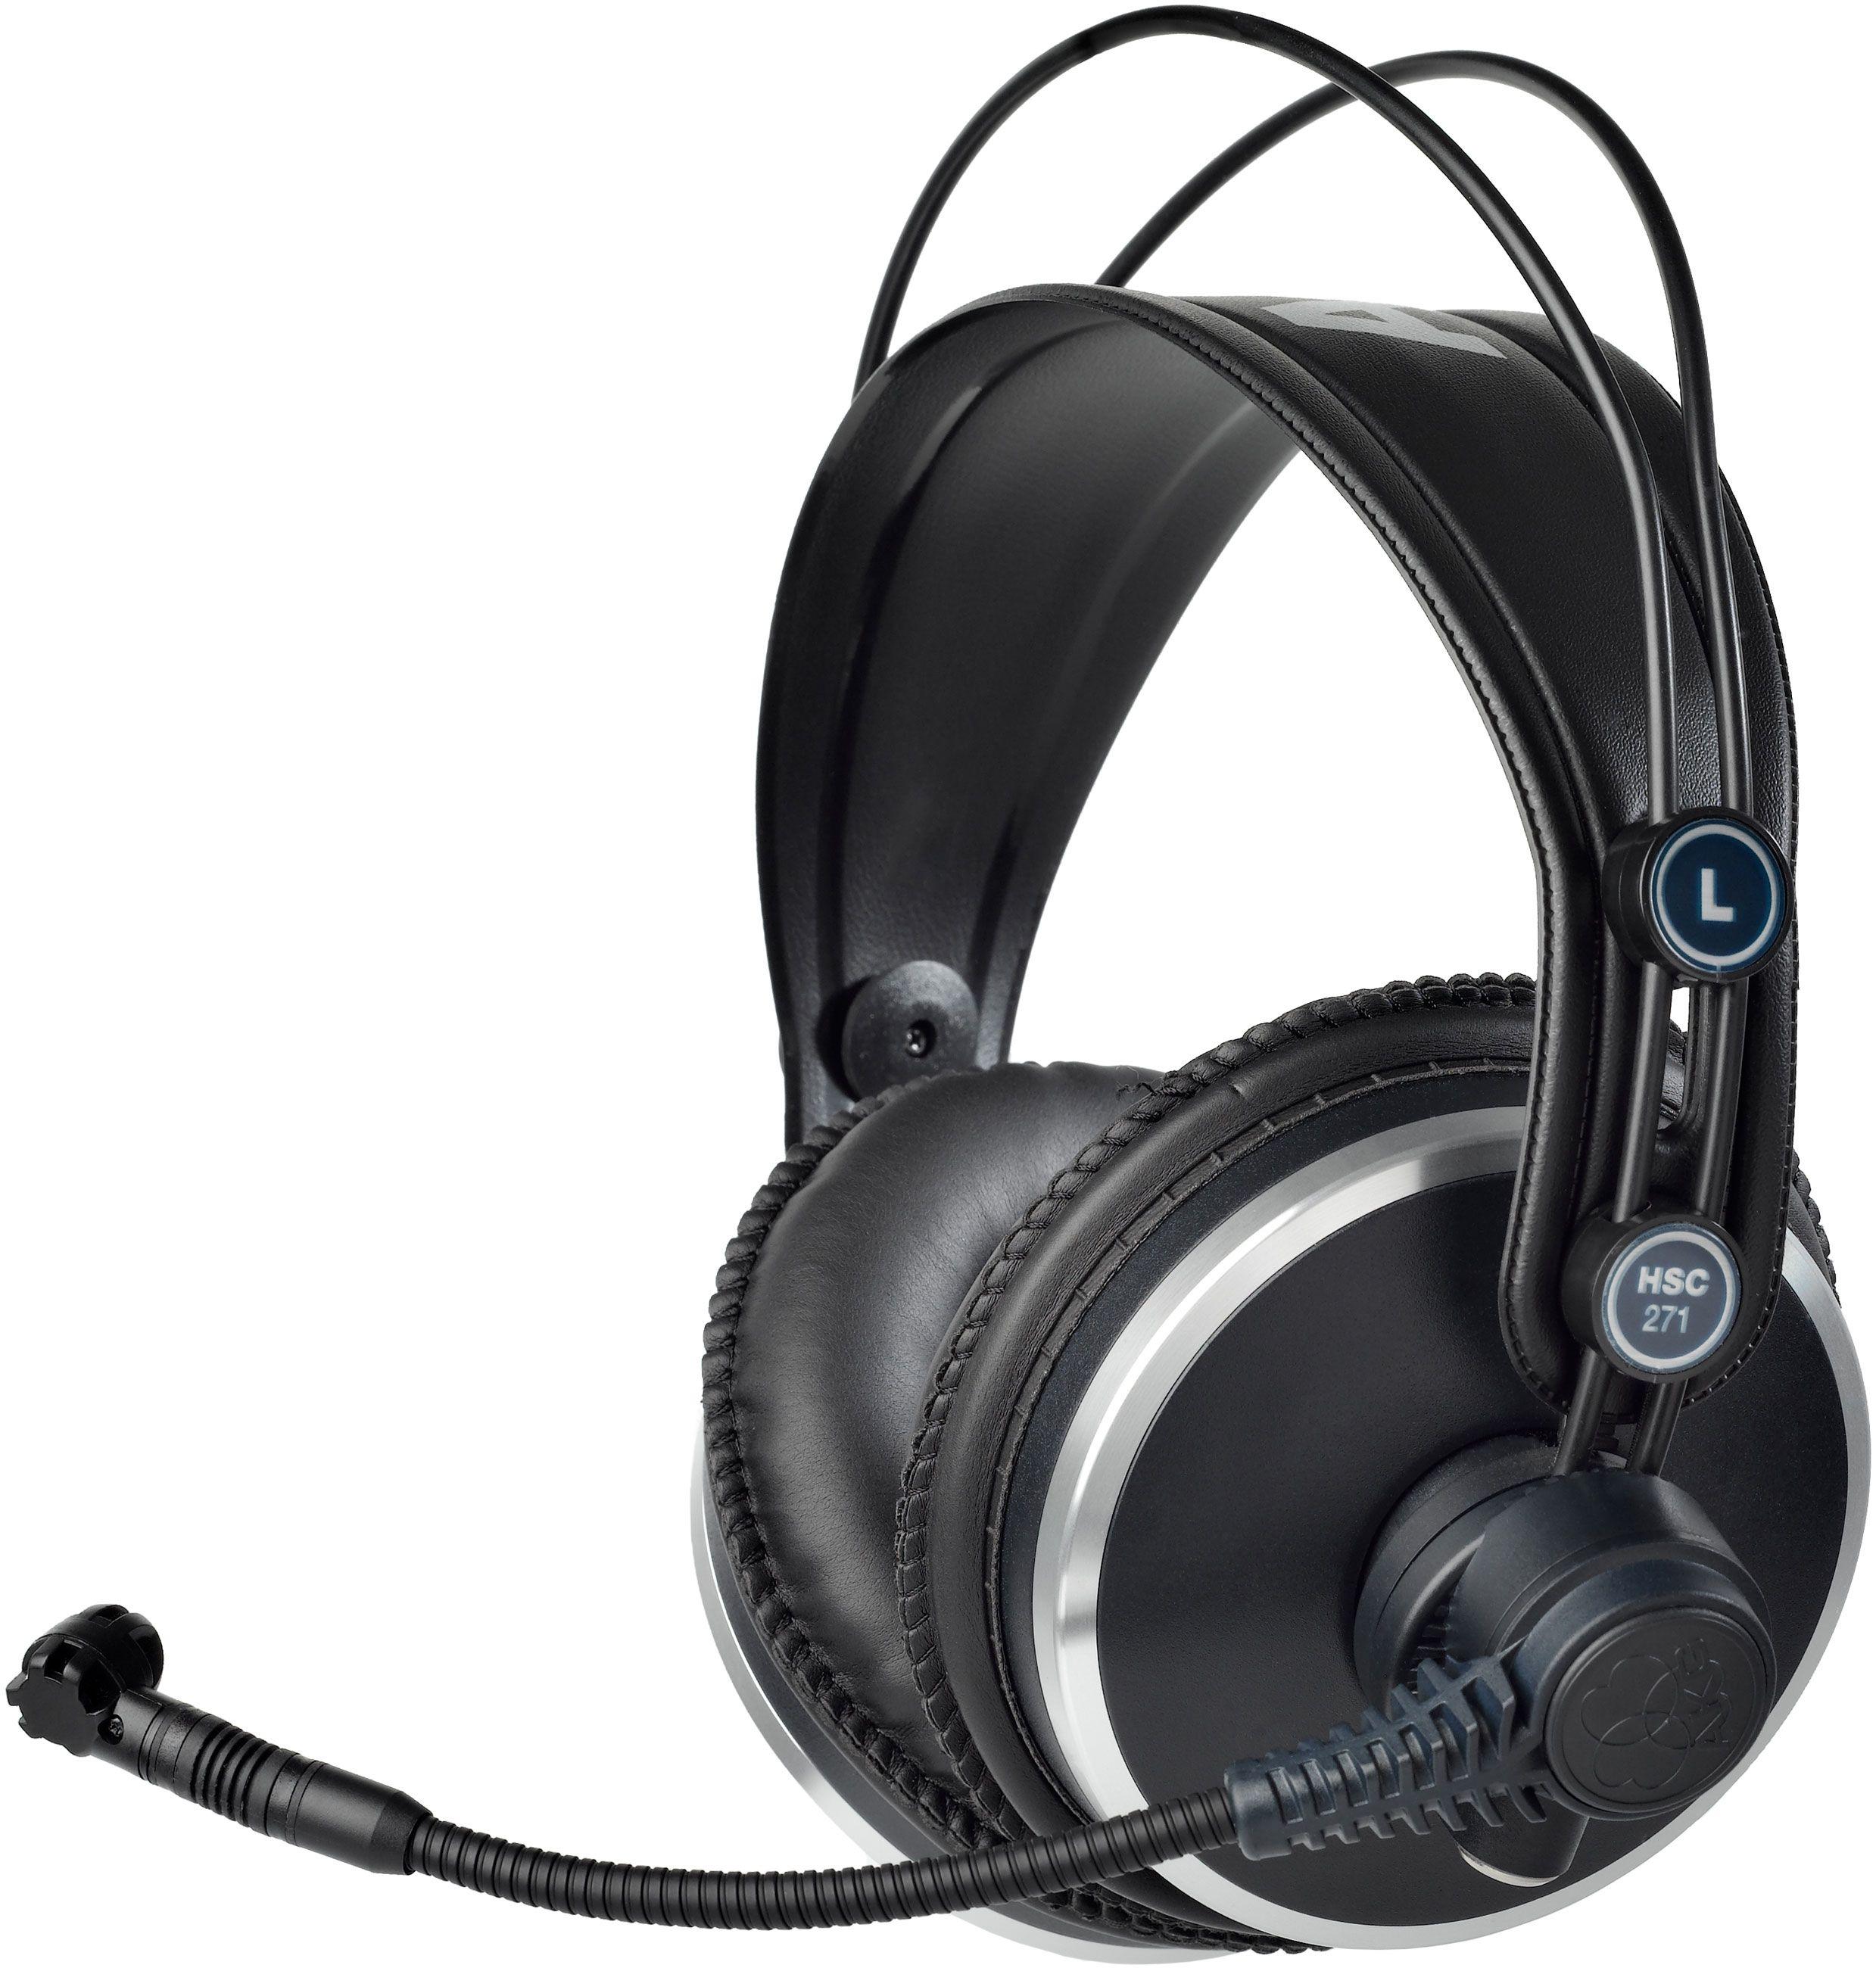 AKG HSC 271 geschlossene Kopfhörer mit Mikrofon (16Hz - 20kHz, 55Ω, 94dB bei 1mW, 200mW)